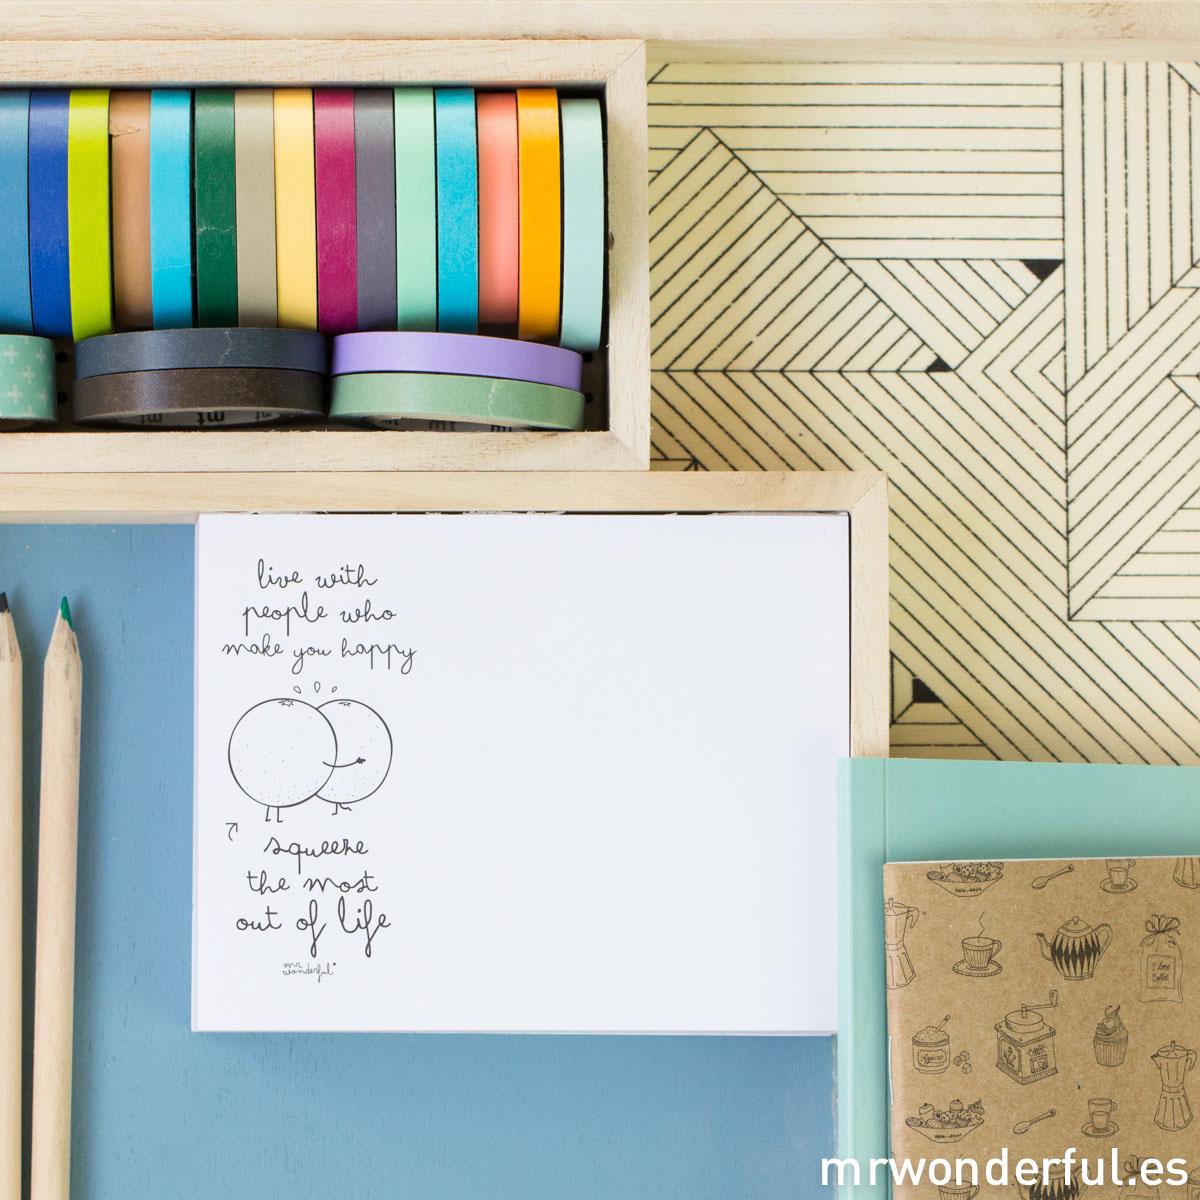 mrwonderful_SU0225_set-3-bandejas-madera-geometricas-1